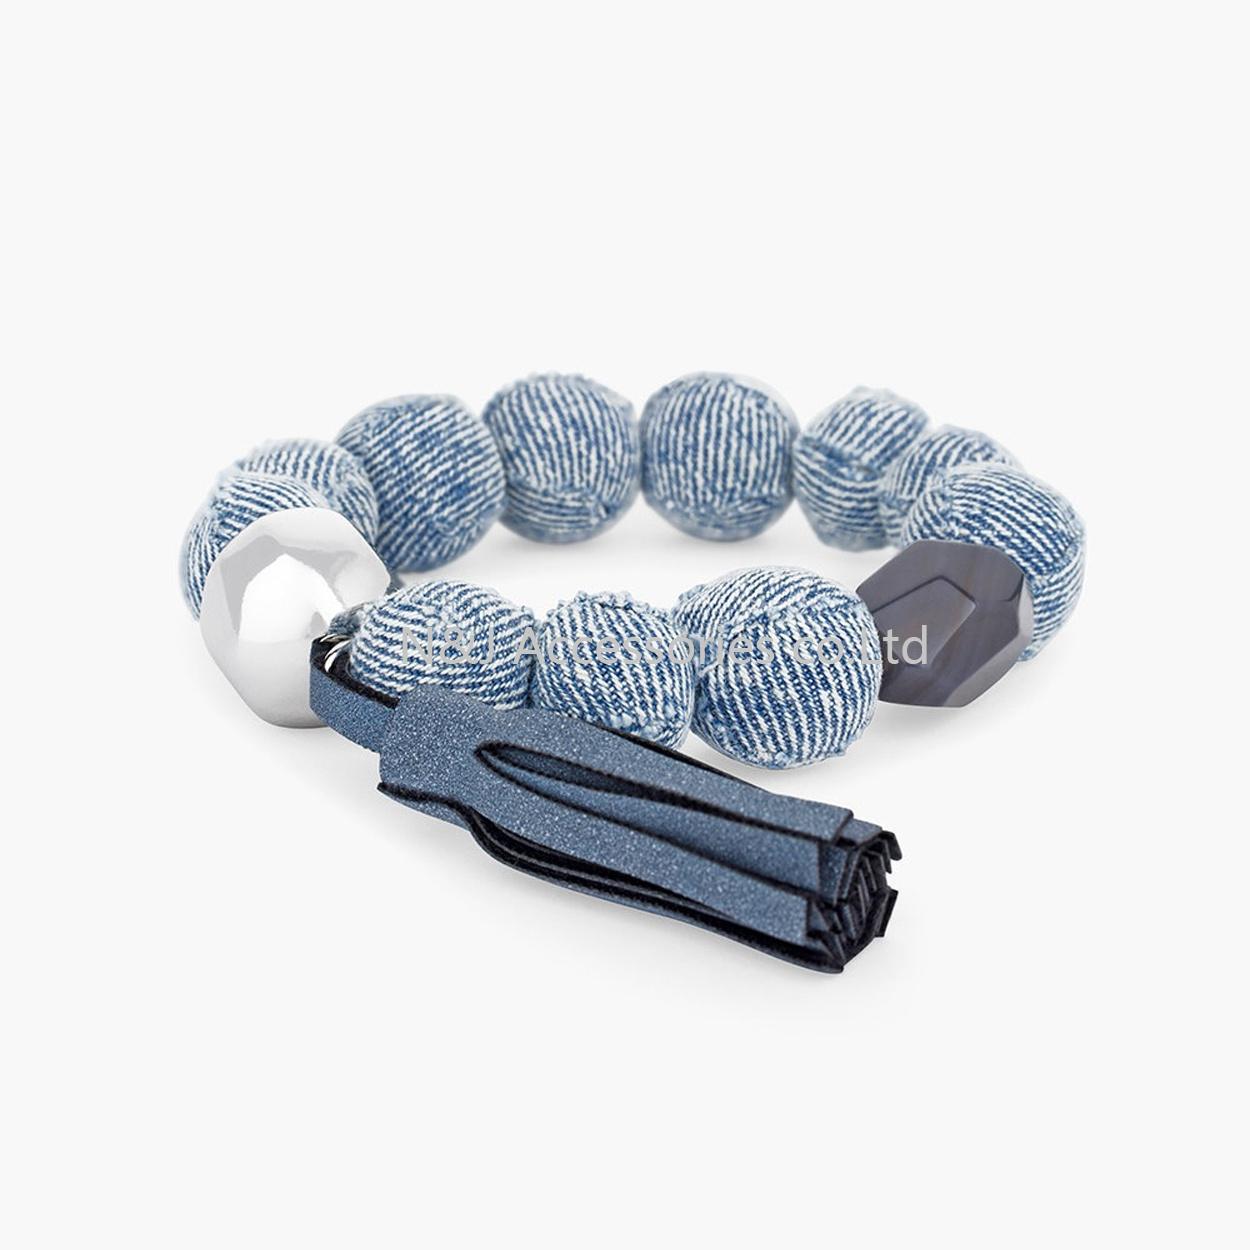 2017 New Arrived Fashion Spring Color Bracelet Natural Colorful Ball Bracelet Beaded Pearl Bracelets Meditation Jewelry